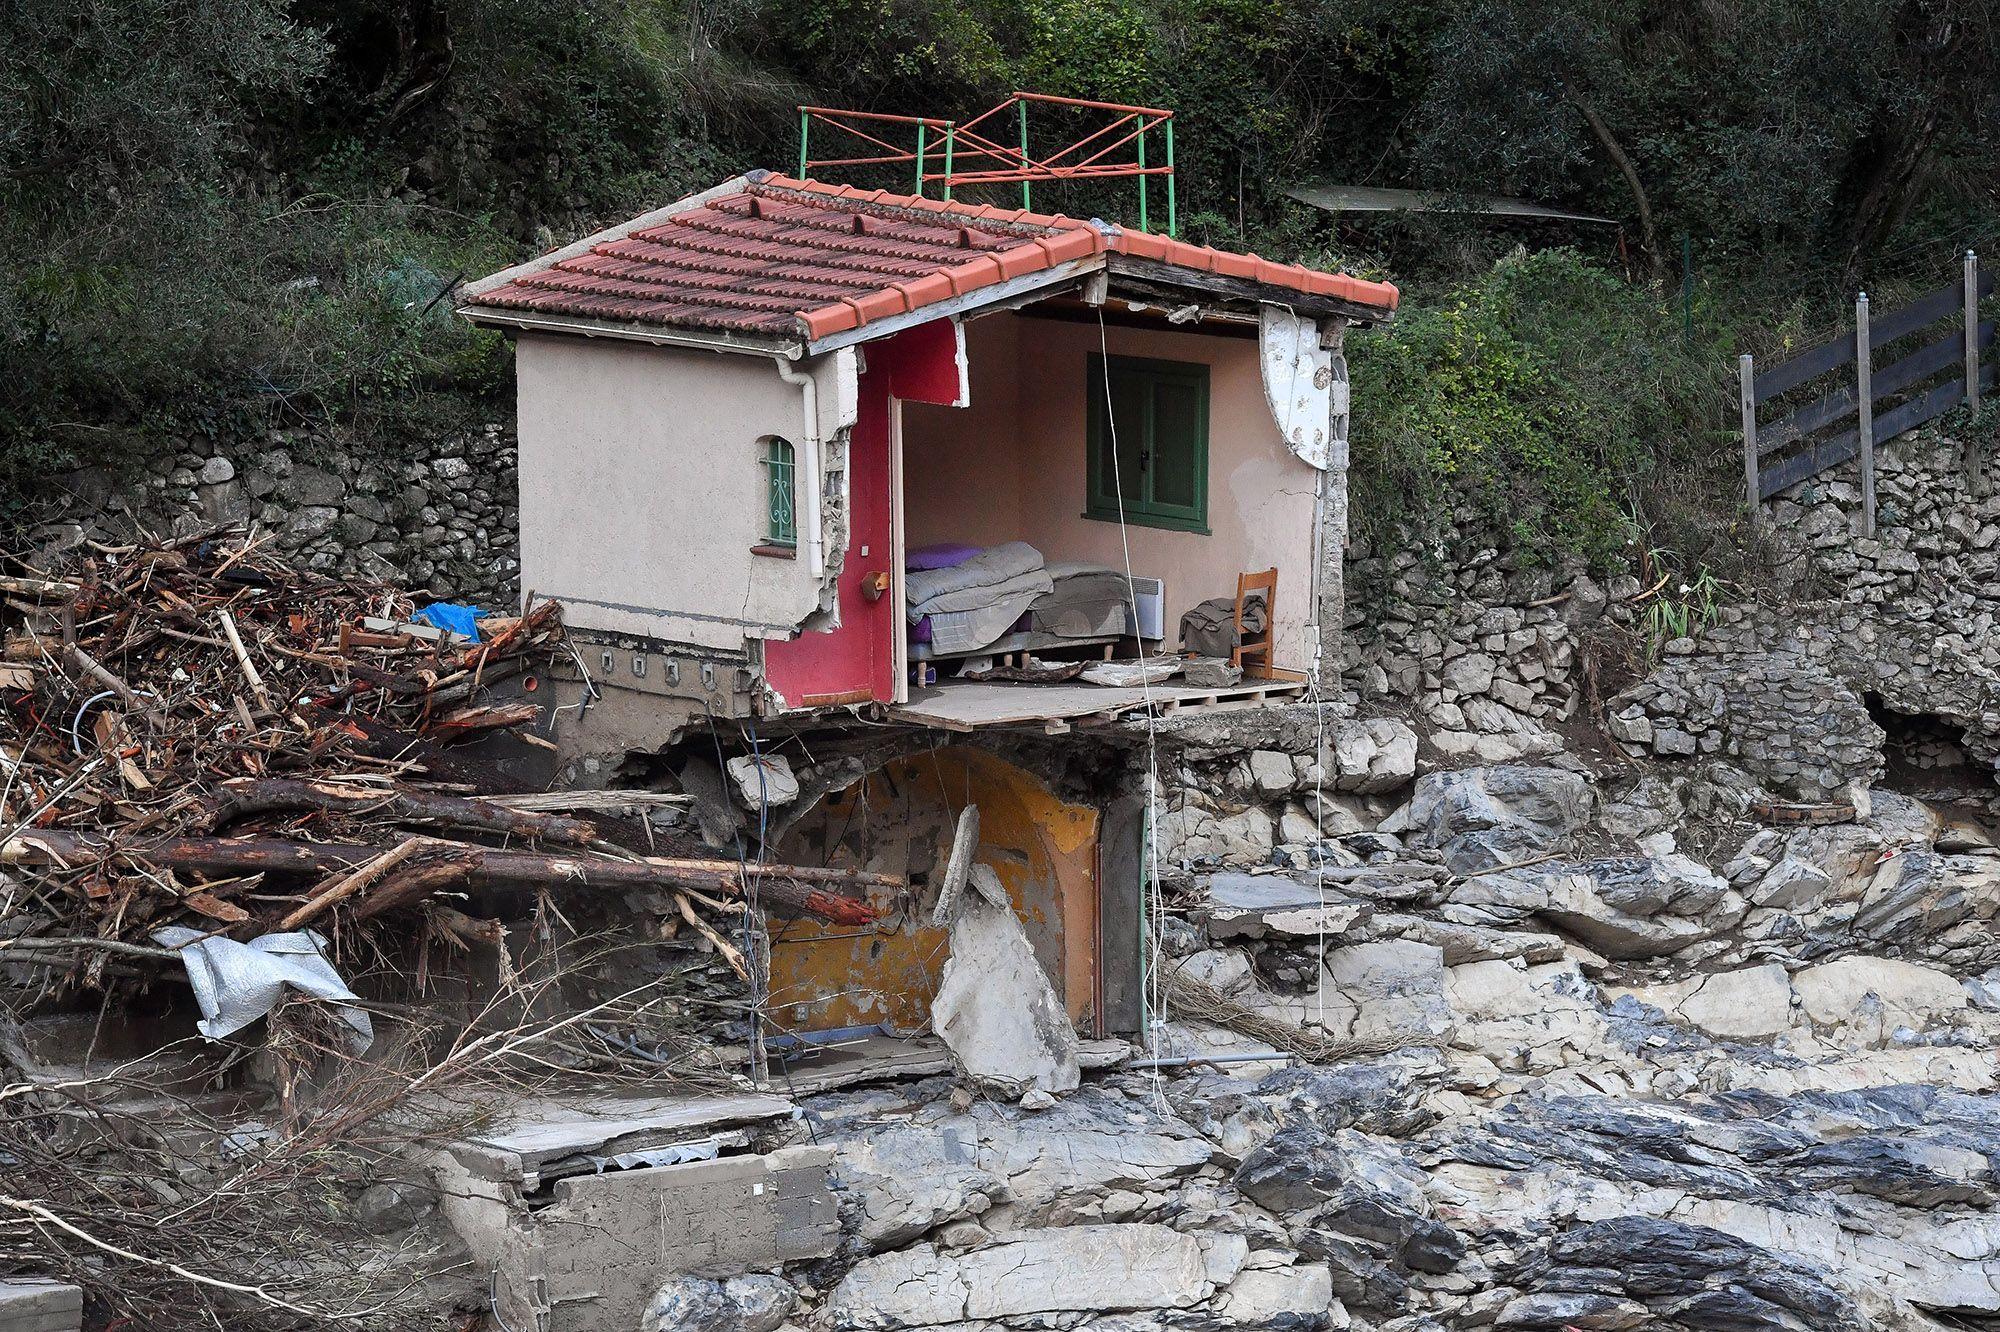 Crues dans les Alpes-Maritimes : le bilan s'alourdit